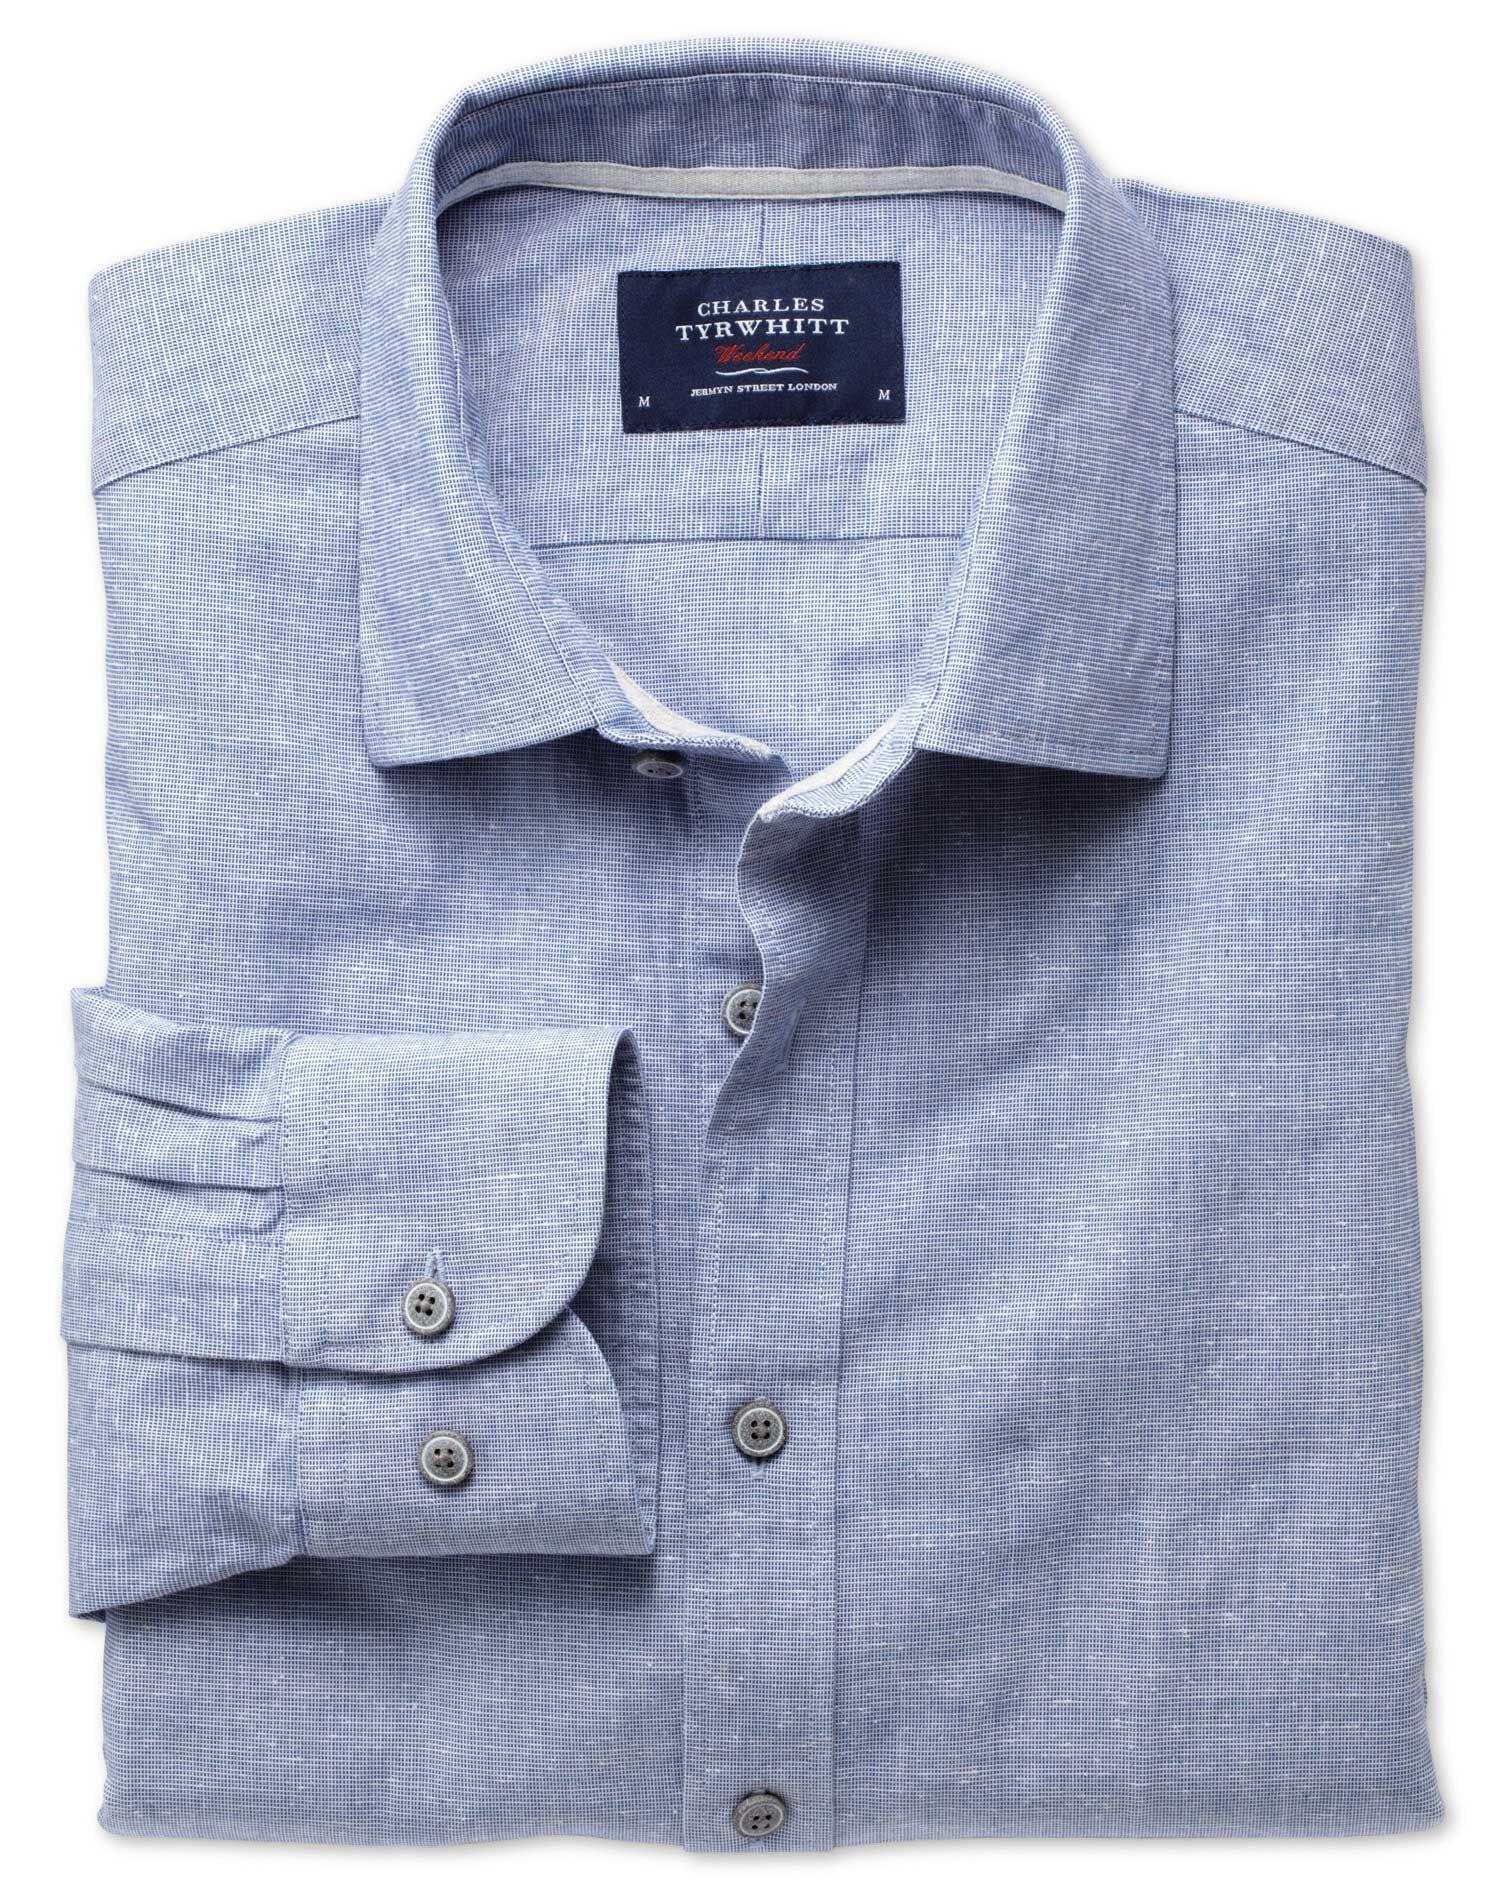 Extra Slim Fit Slub Cotton Blue Shirt Single Cuff Size Small by Charles Tyrwhitt